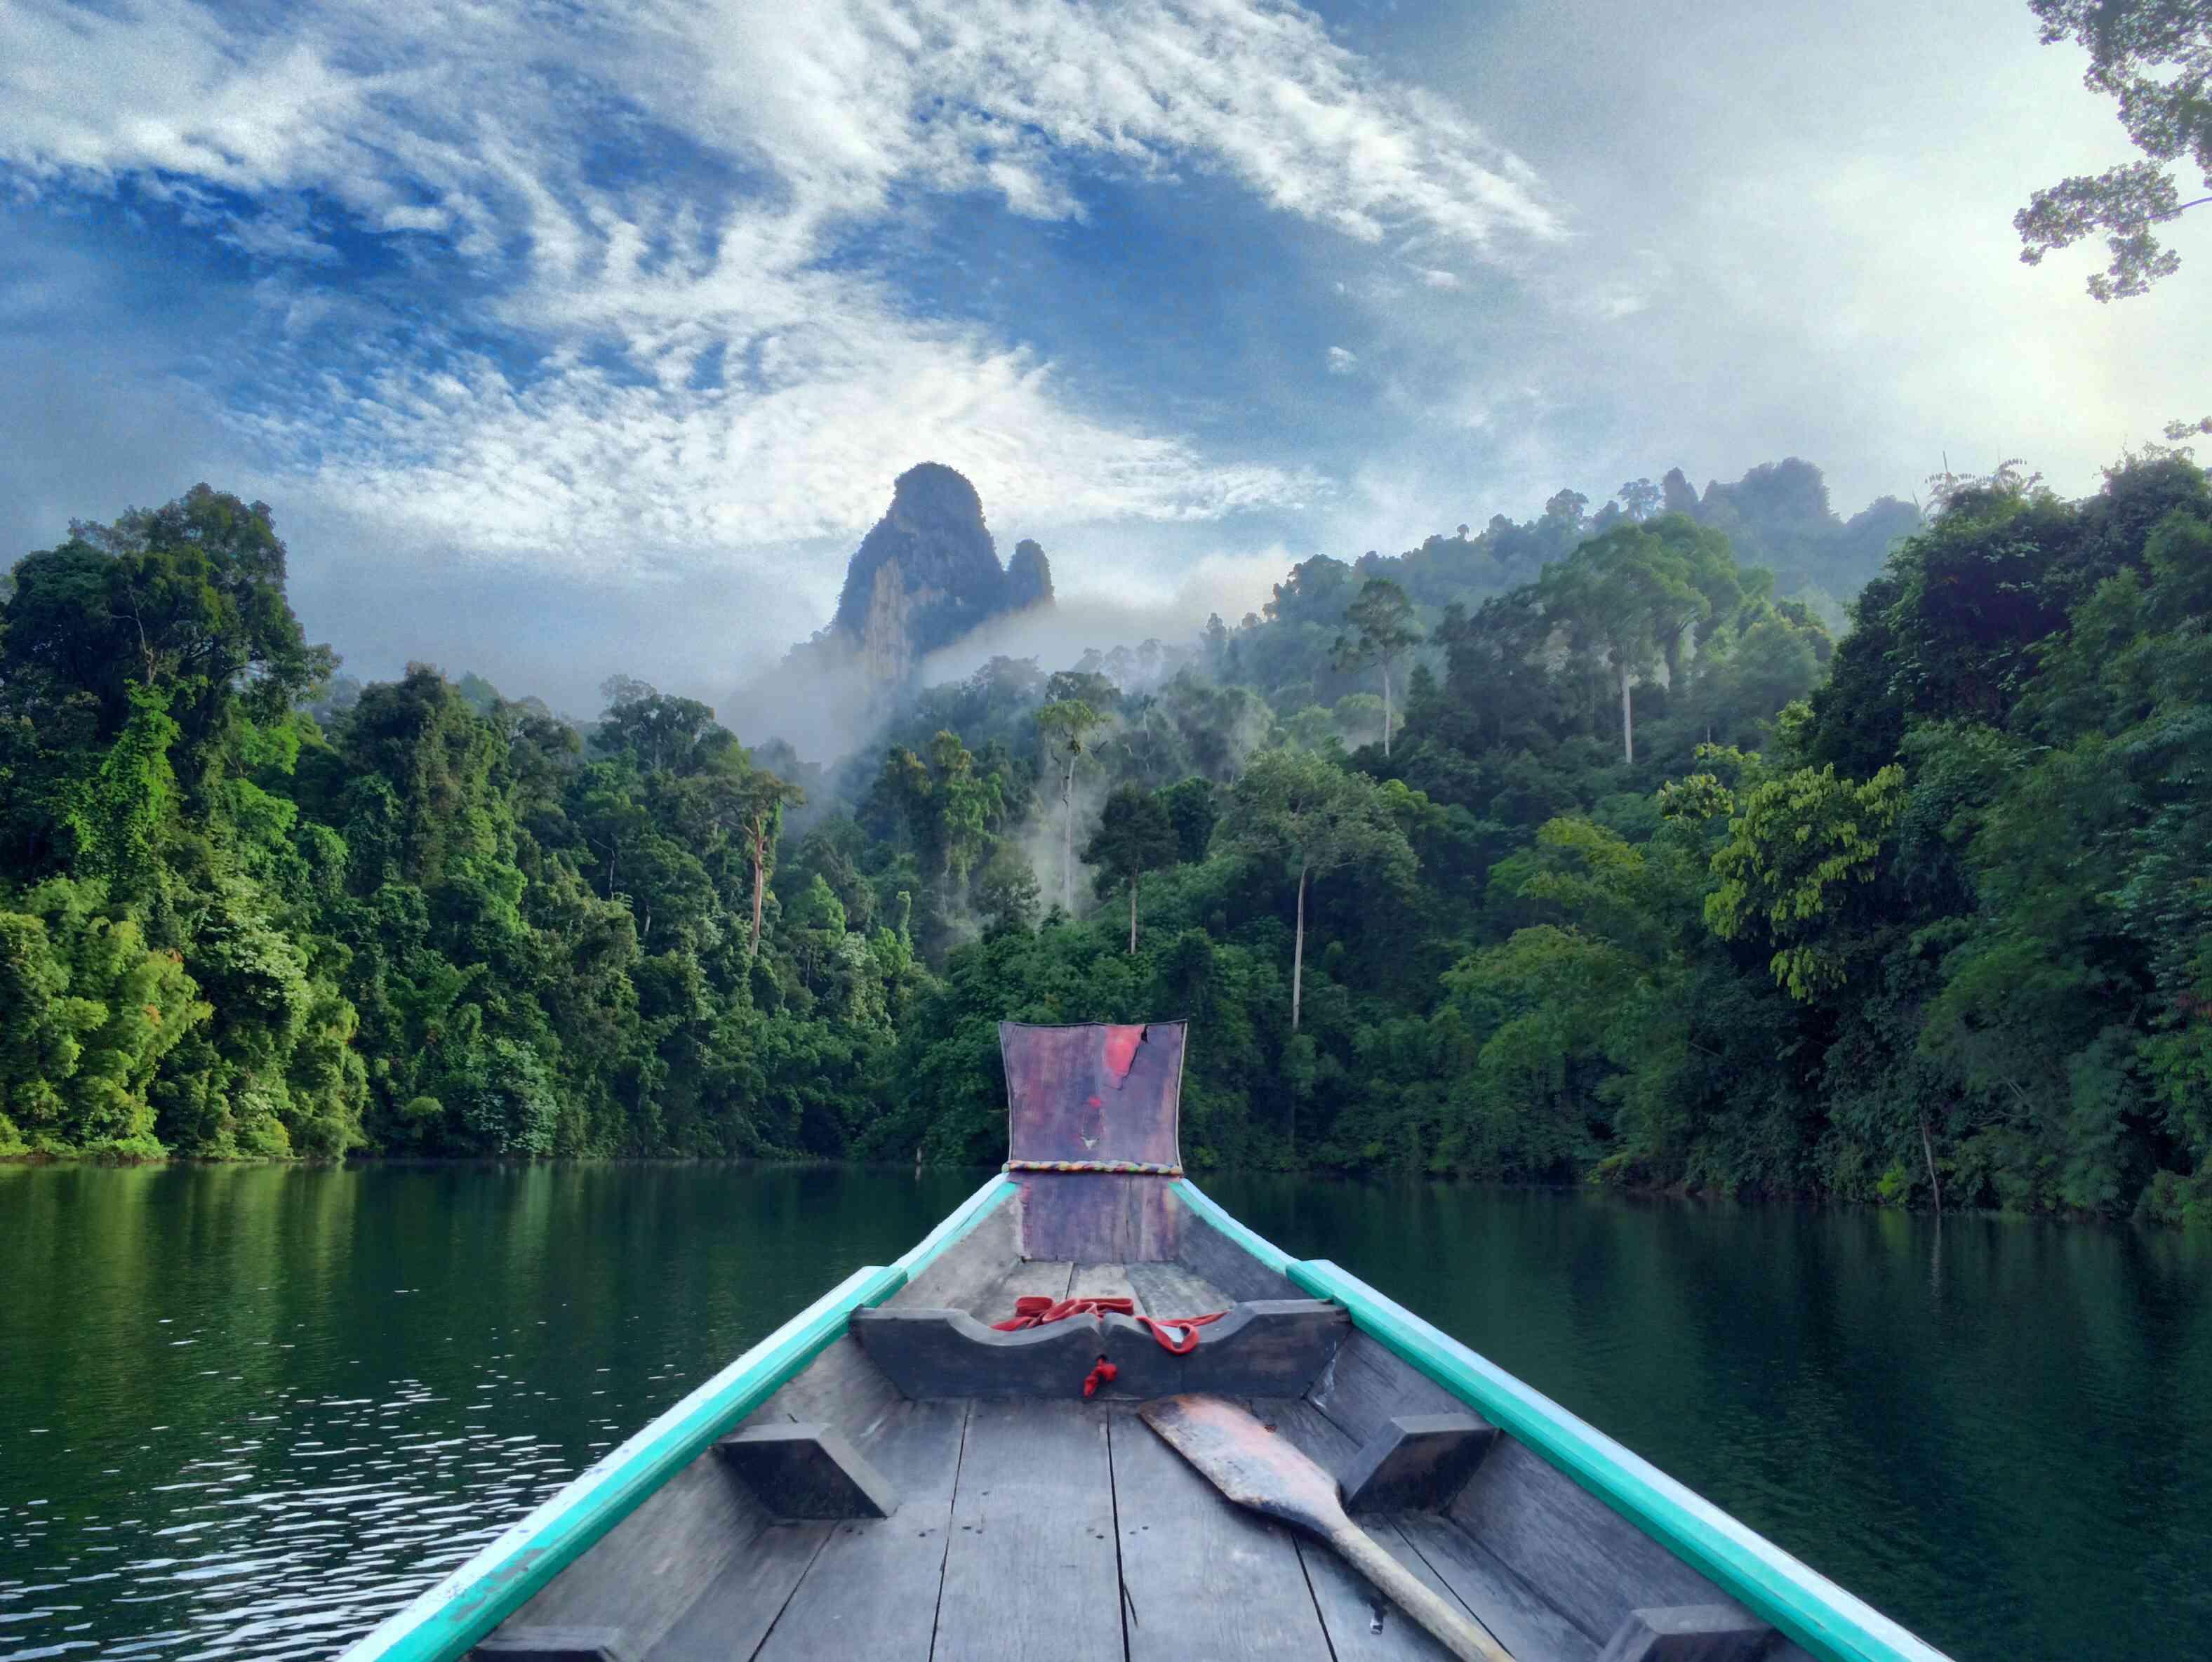 Little Amazon, Takua Pa